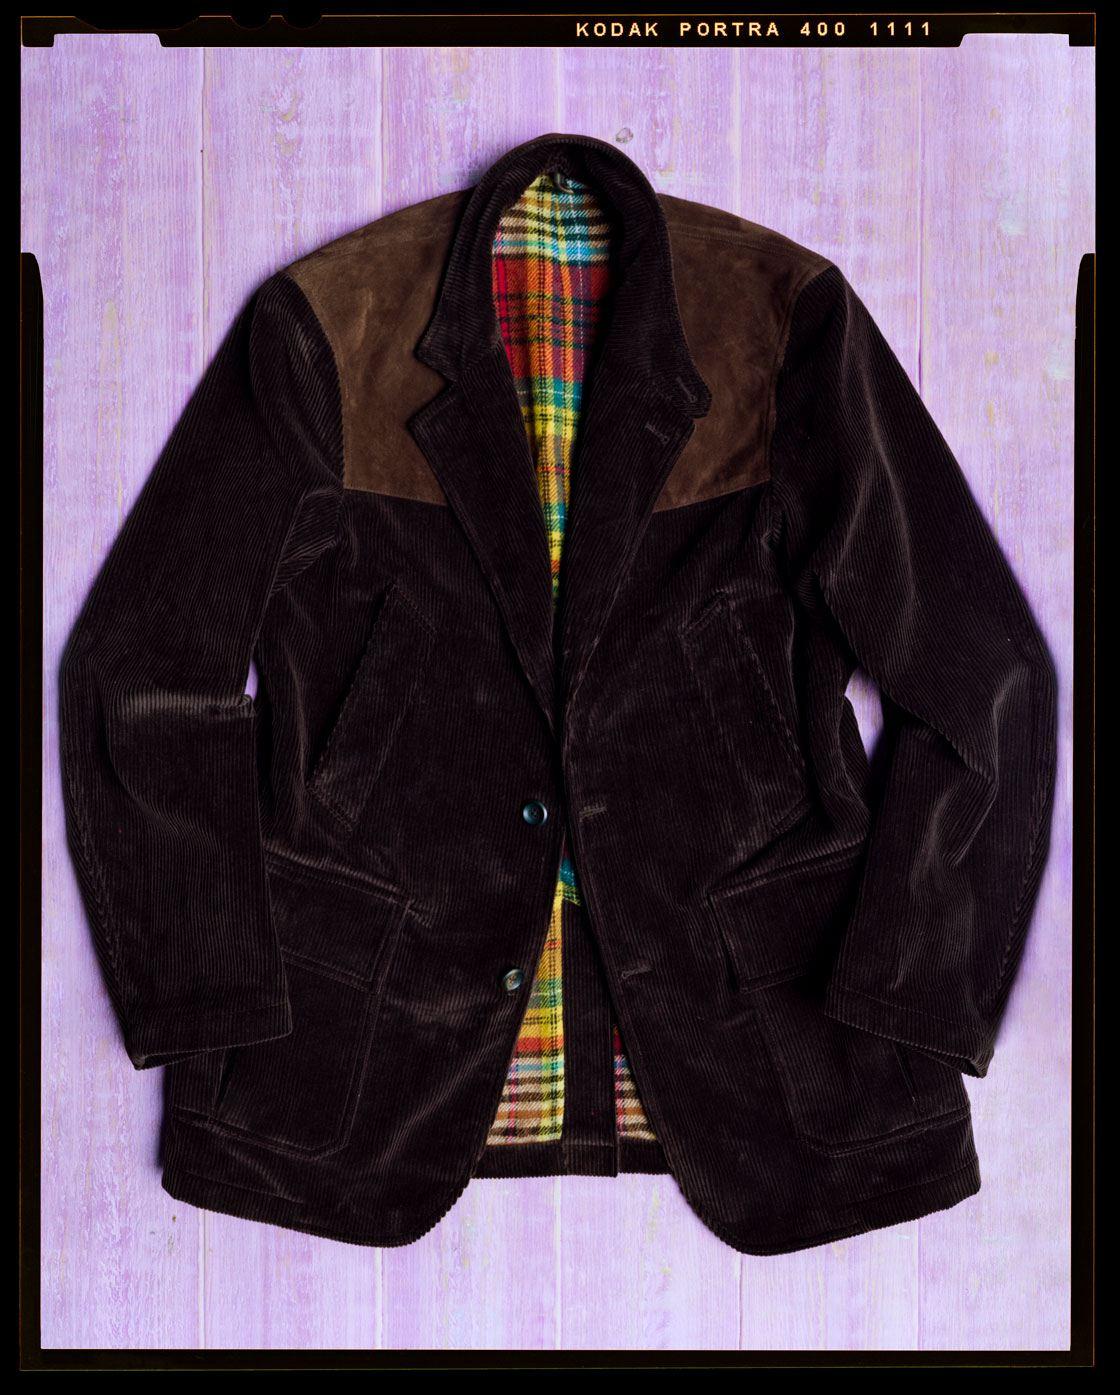 The Corduroy Games Coat